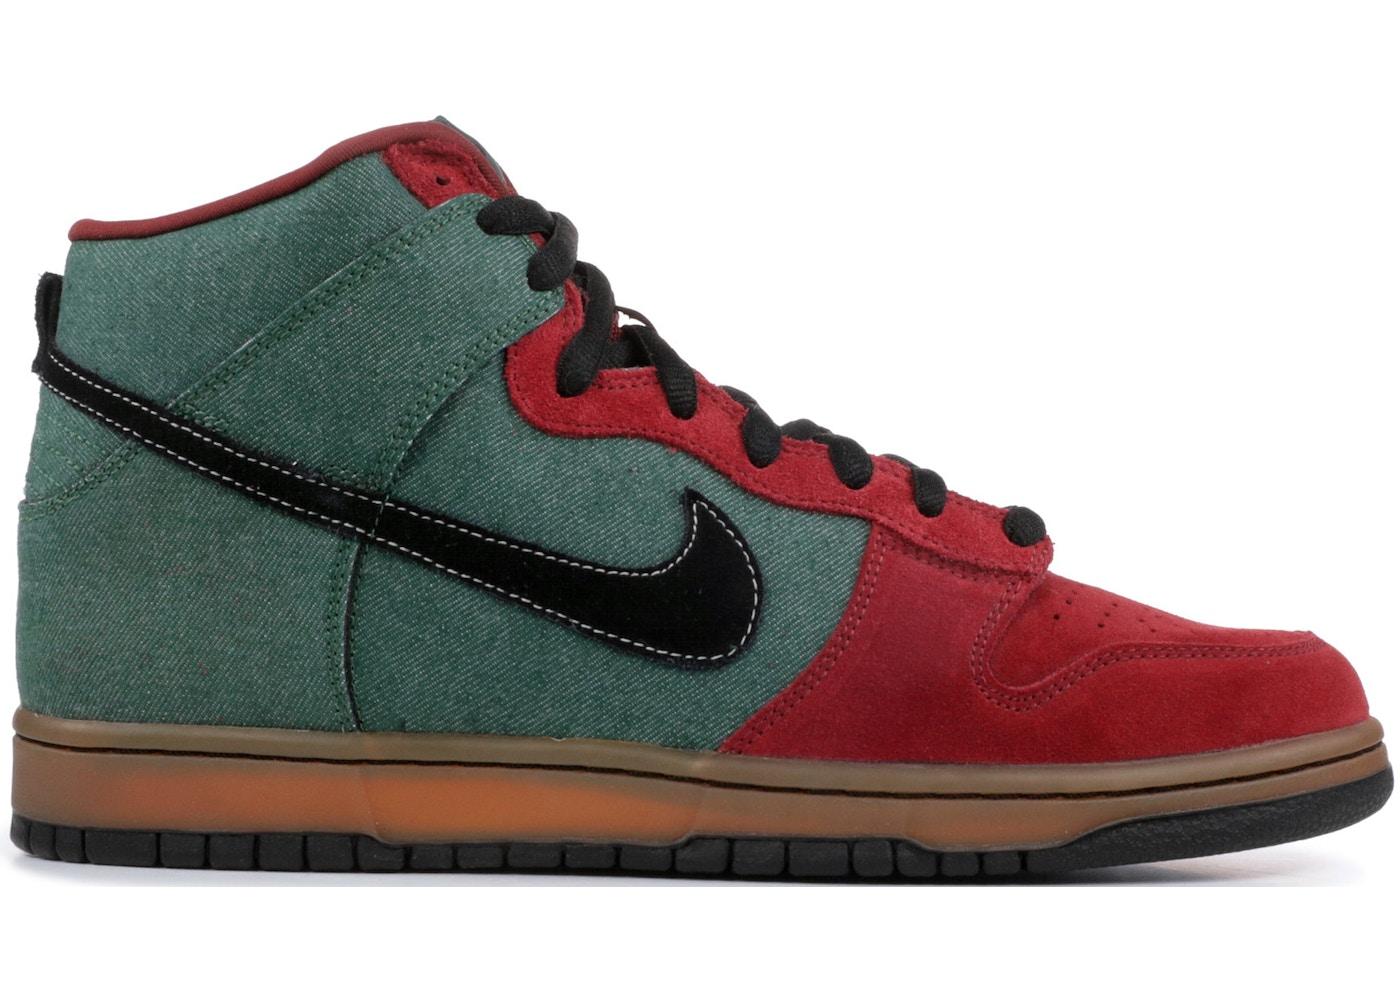 1bdadfadb2163d Sell. or Ask. Size  5.5. View All Bids. Nike SB Dunk High Goofy Boy